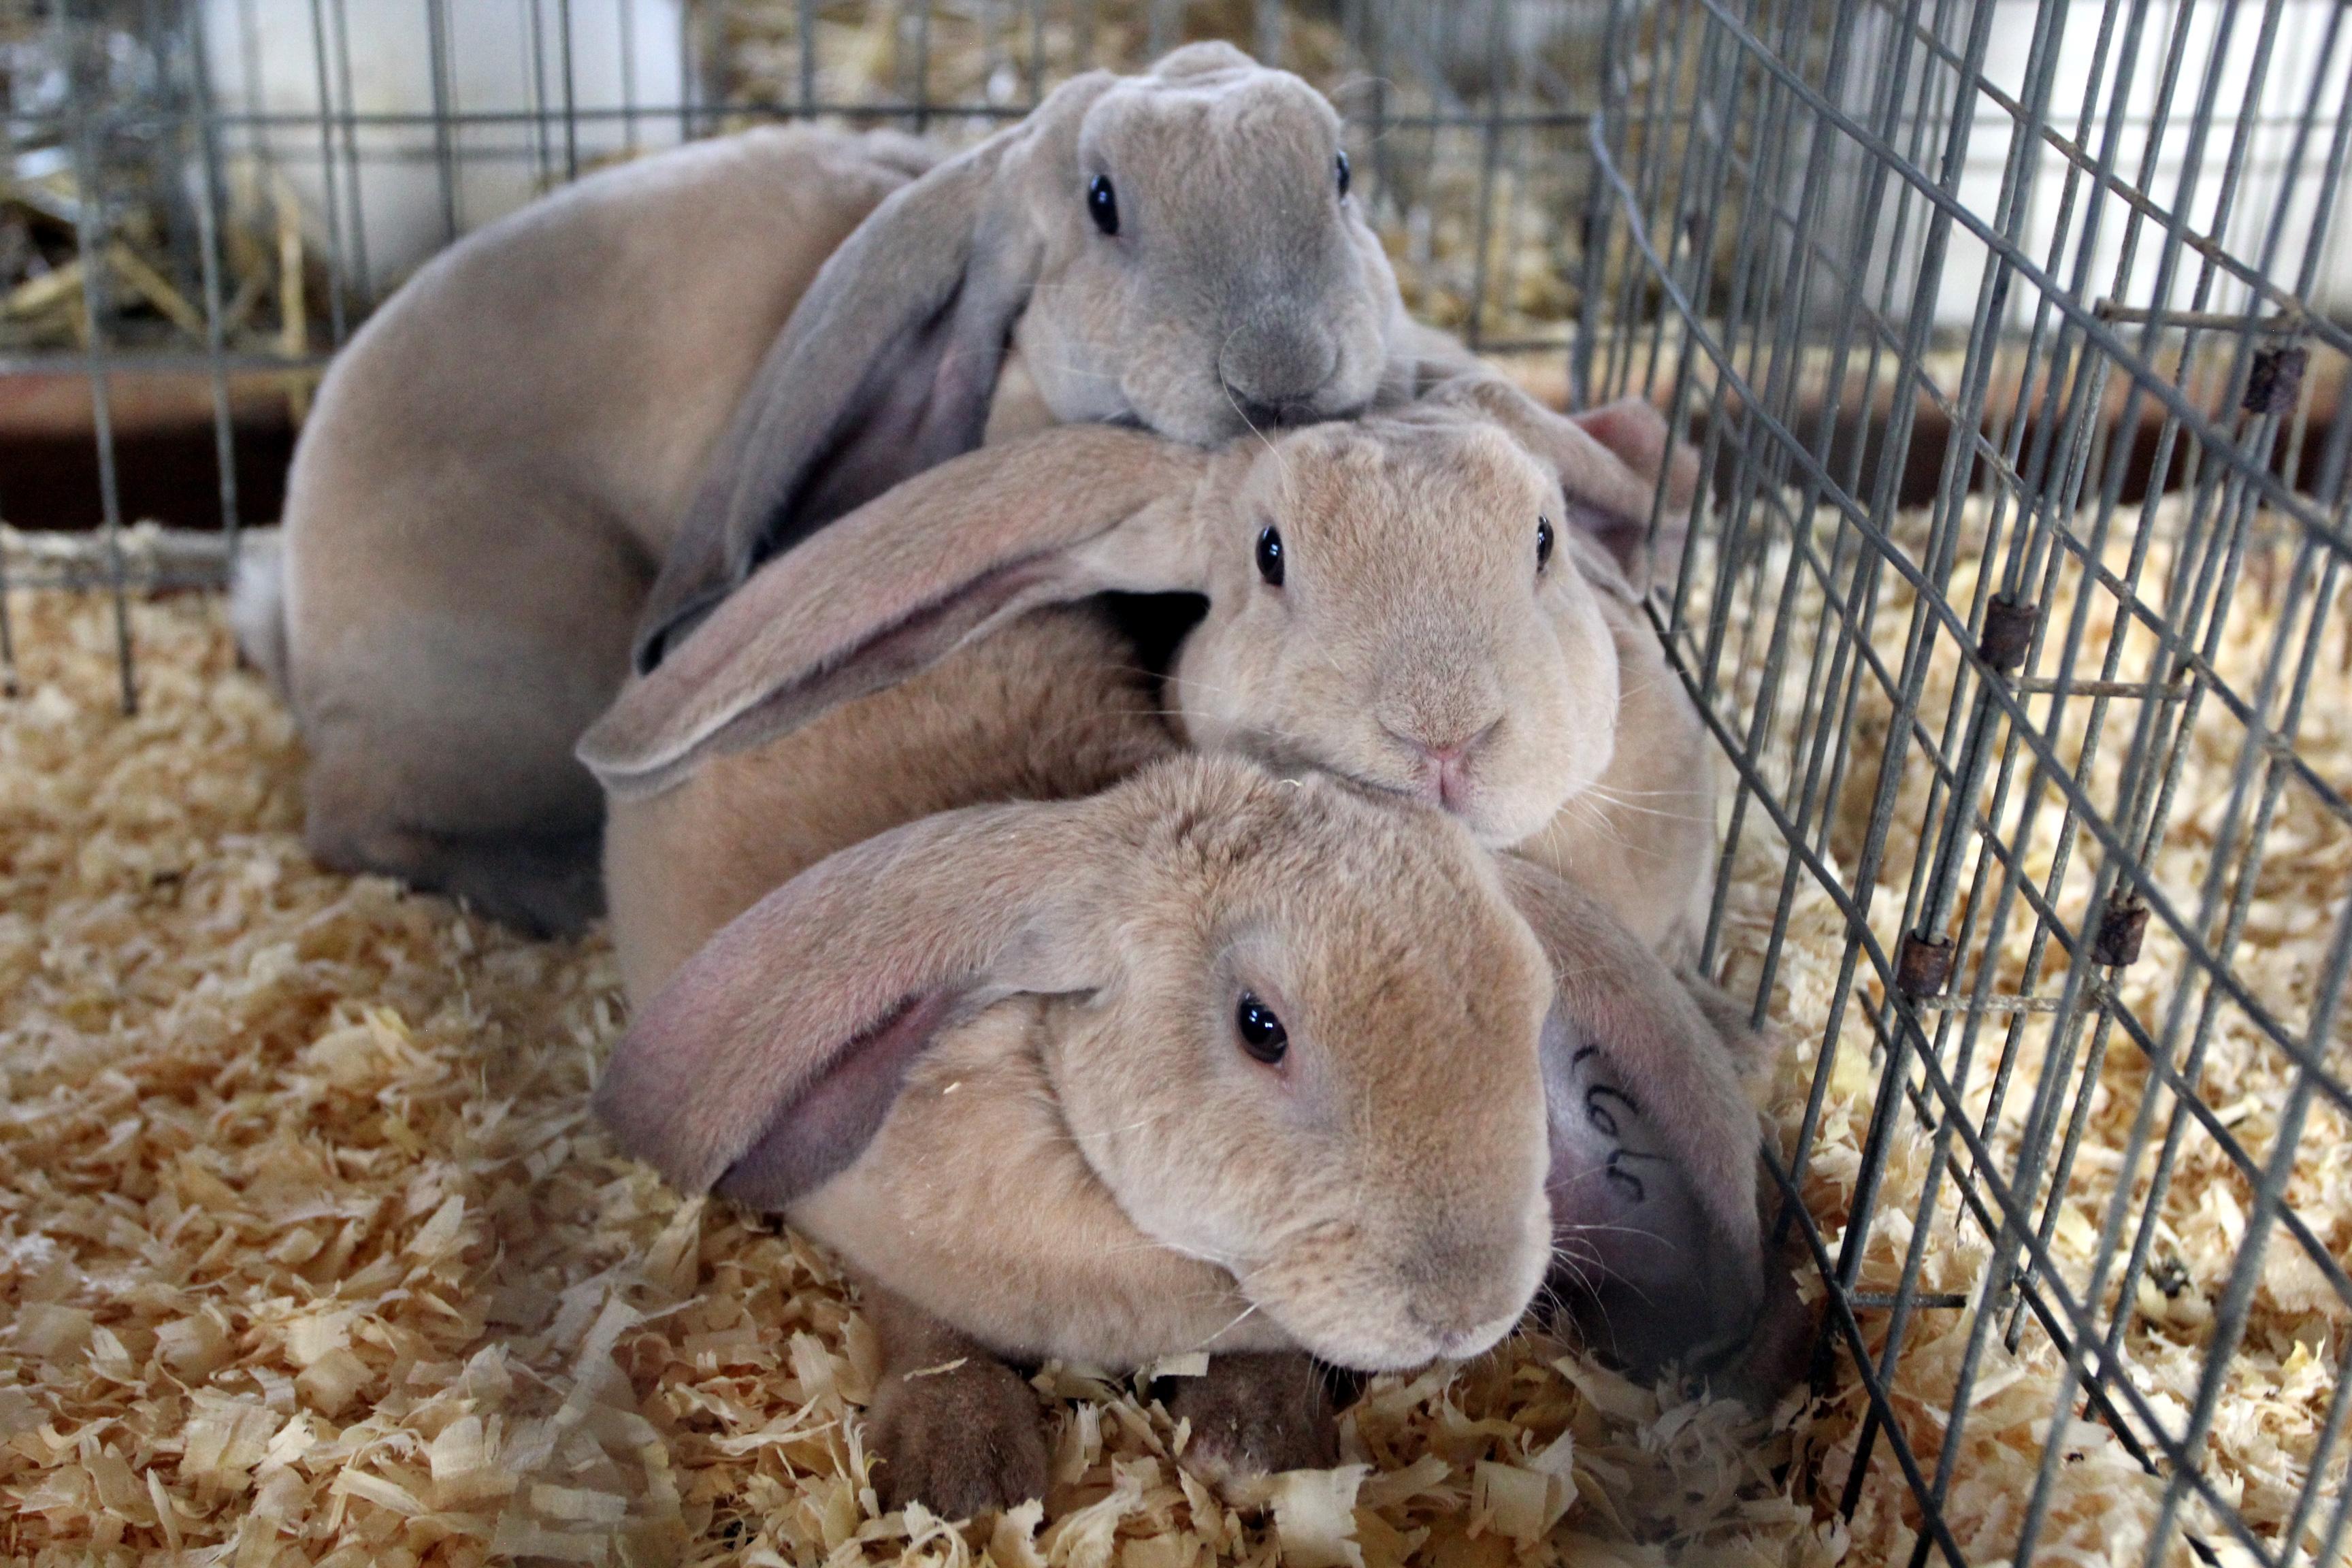 Bunny Love Animals On Show At County Fair